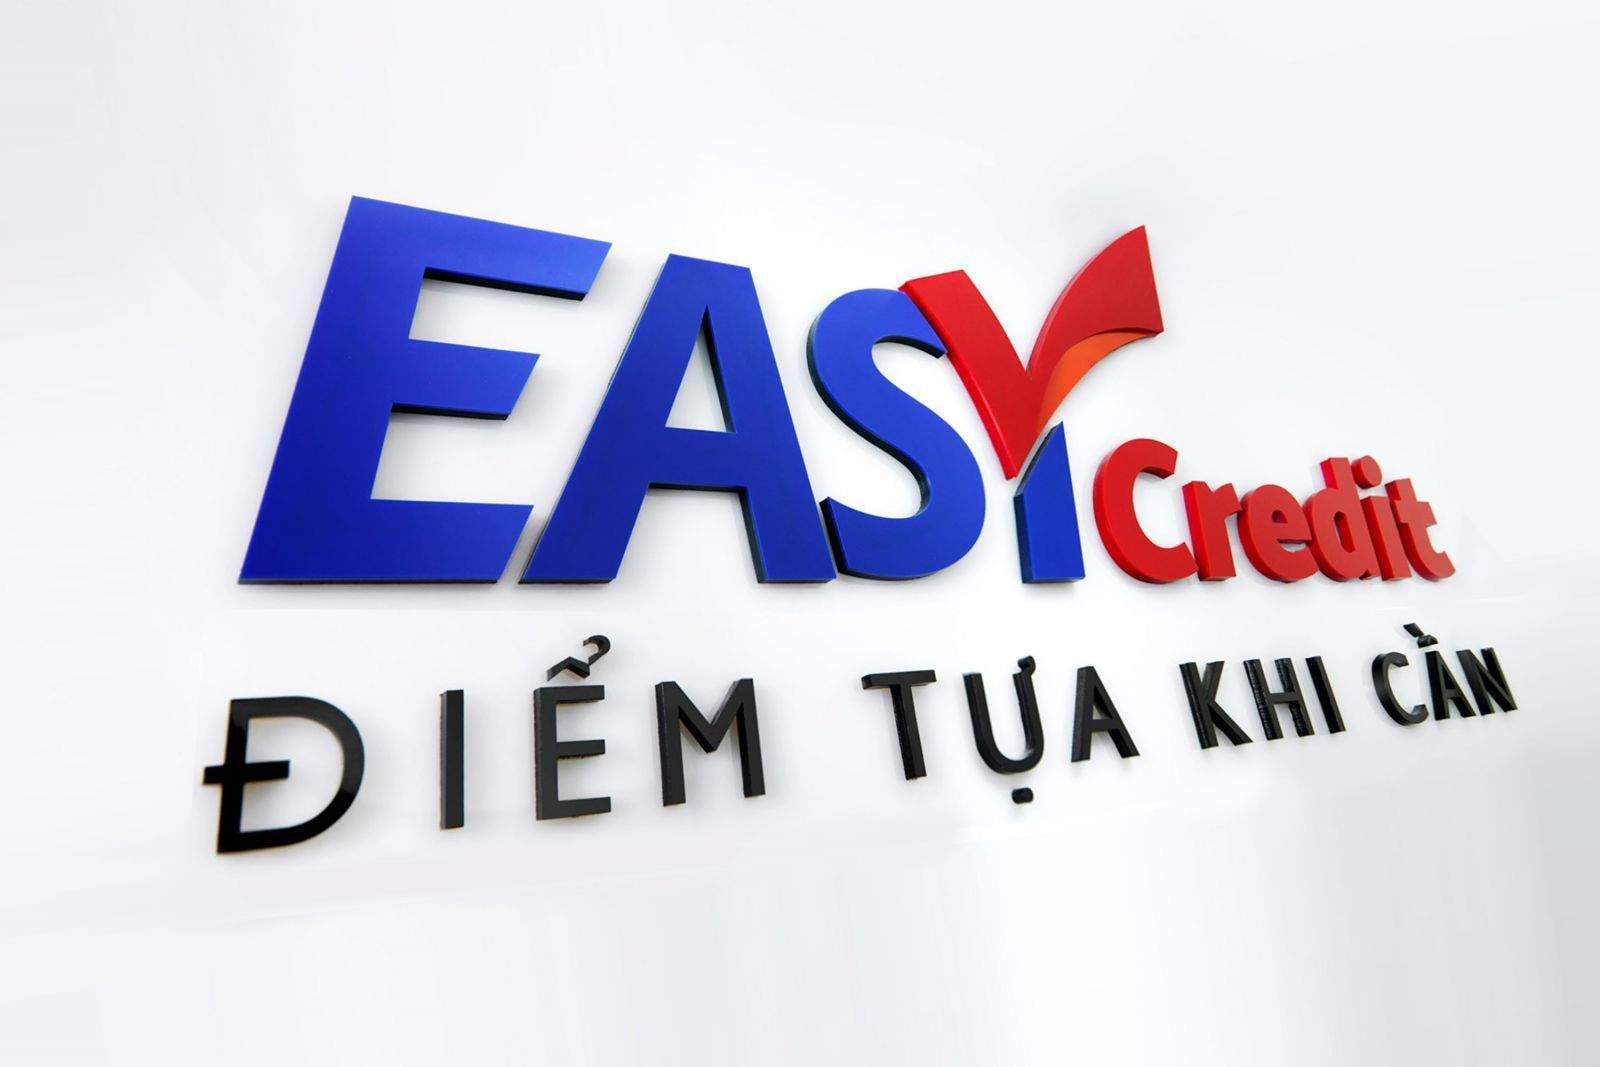 Vay tiền tại Easy Credit